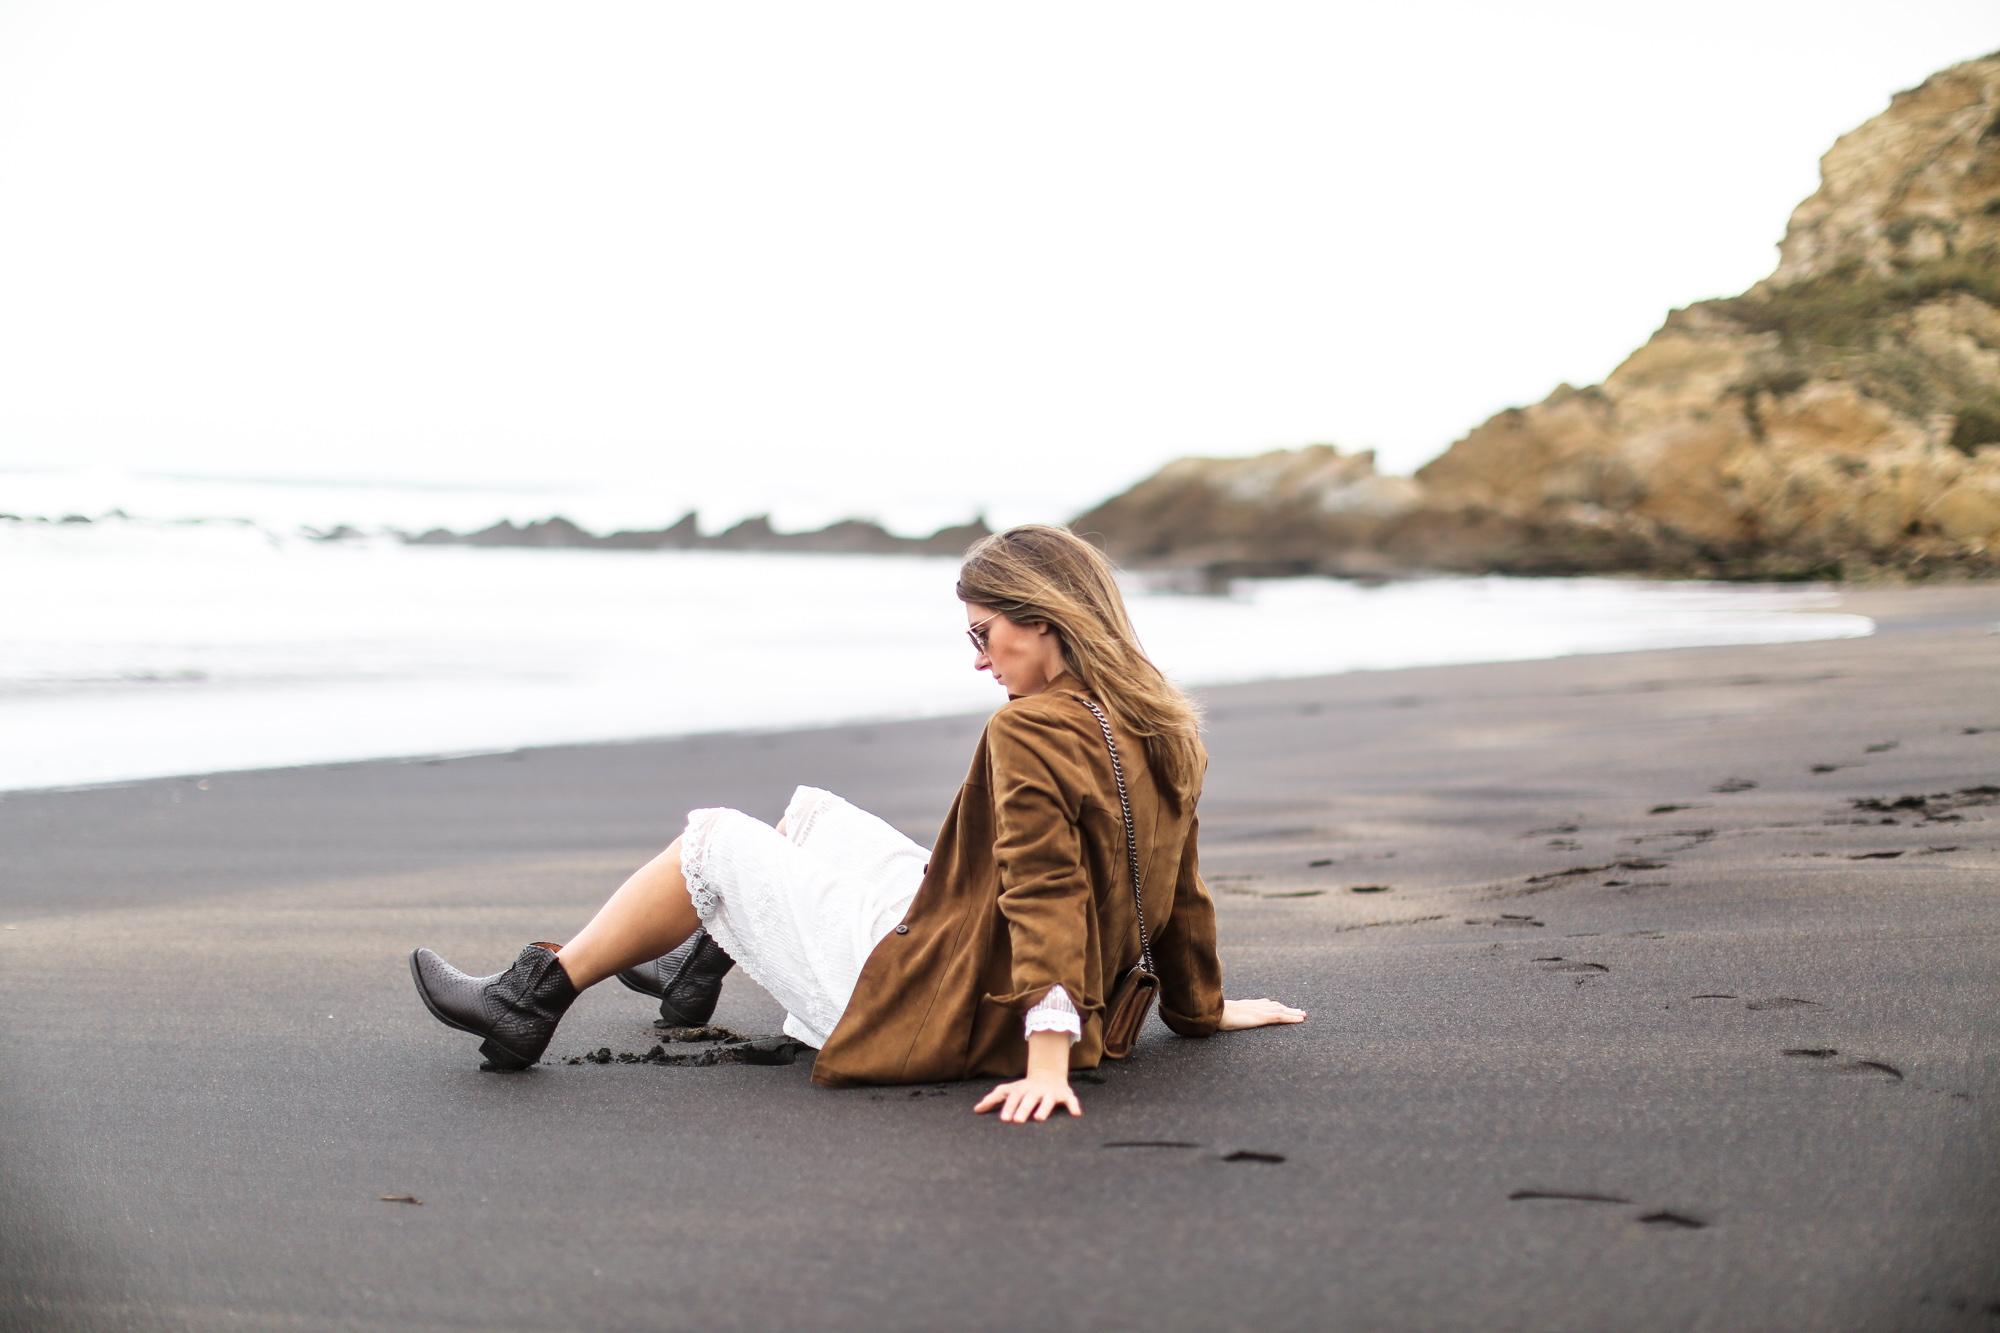 clochet_streetstyle_white_boho_midi_dress_cowboy_phyton_boots-6